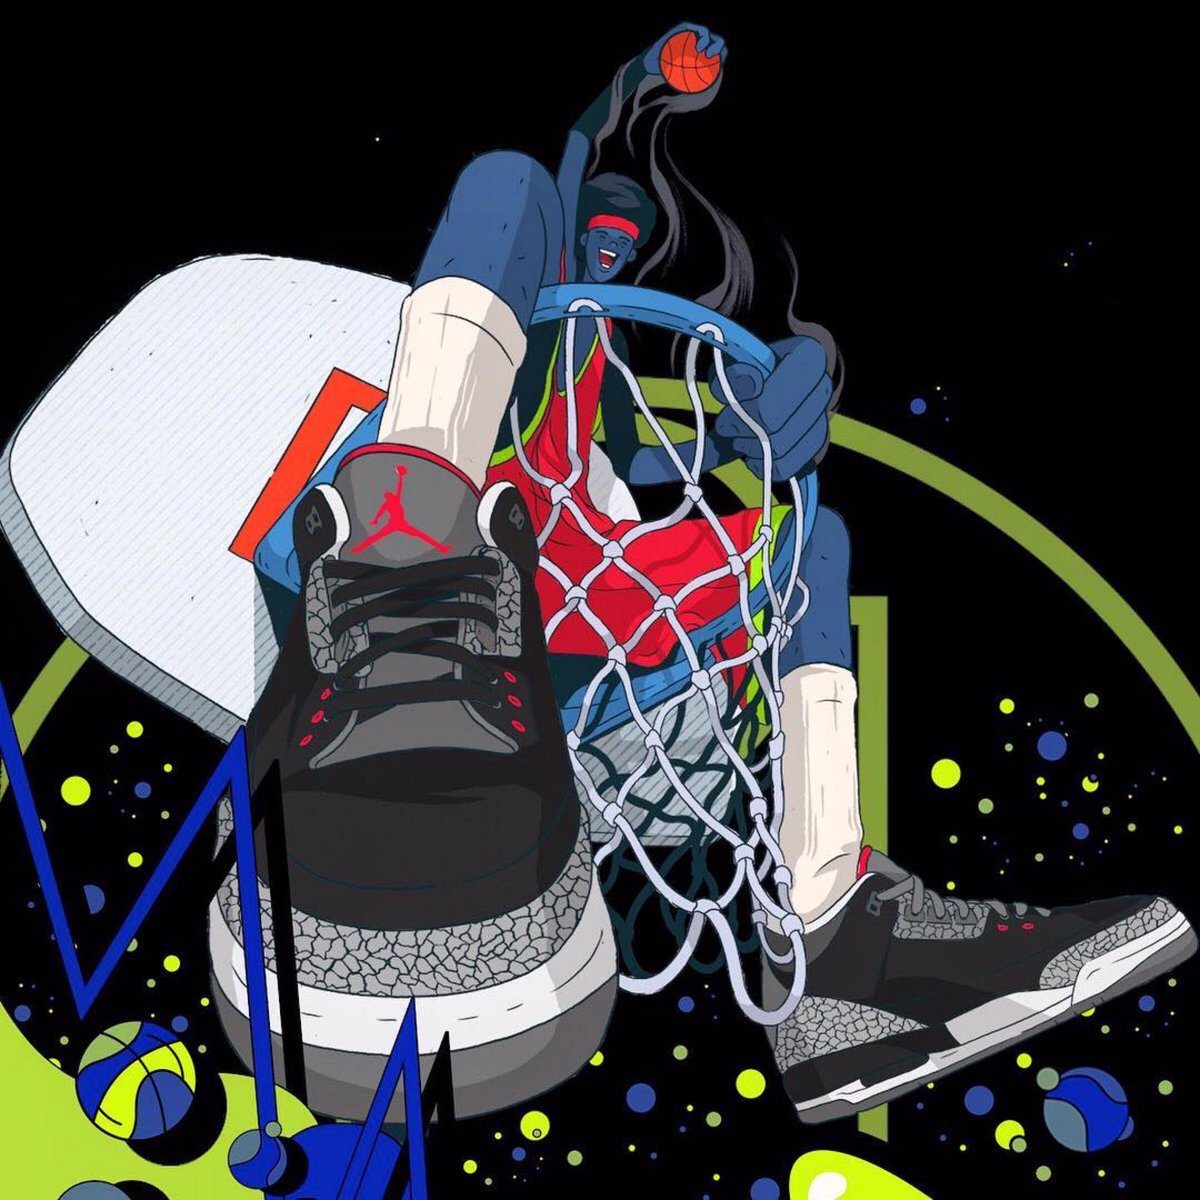 Black cement goes with everything. Illustration by @ilovedust ・・・ JUMPMAN JUMPMAN JUMPMAN  #mjmondays #jordan #jordan1 #illustration #ilovedust #michaeljordan #ball #characterdesign #jordan3 #jumpman #thatniquelife #hoopculture #ballislife https://t.co/hfAb06at0c